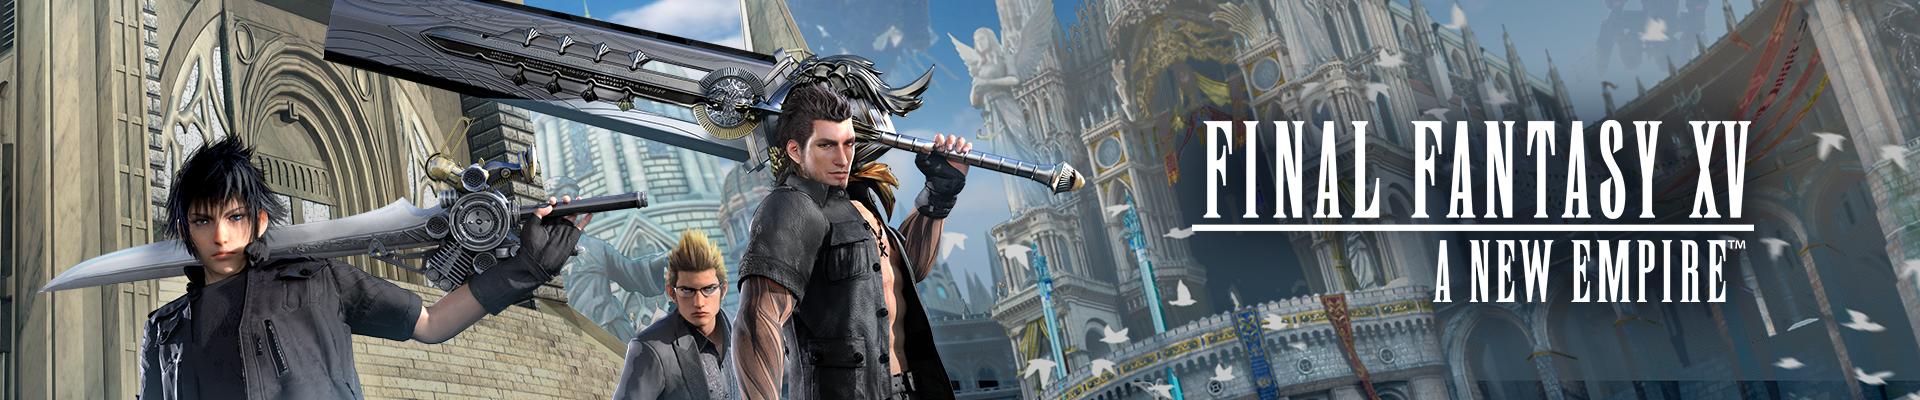 Final Fantasy: New Empire